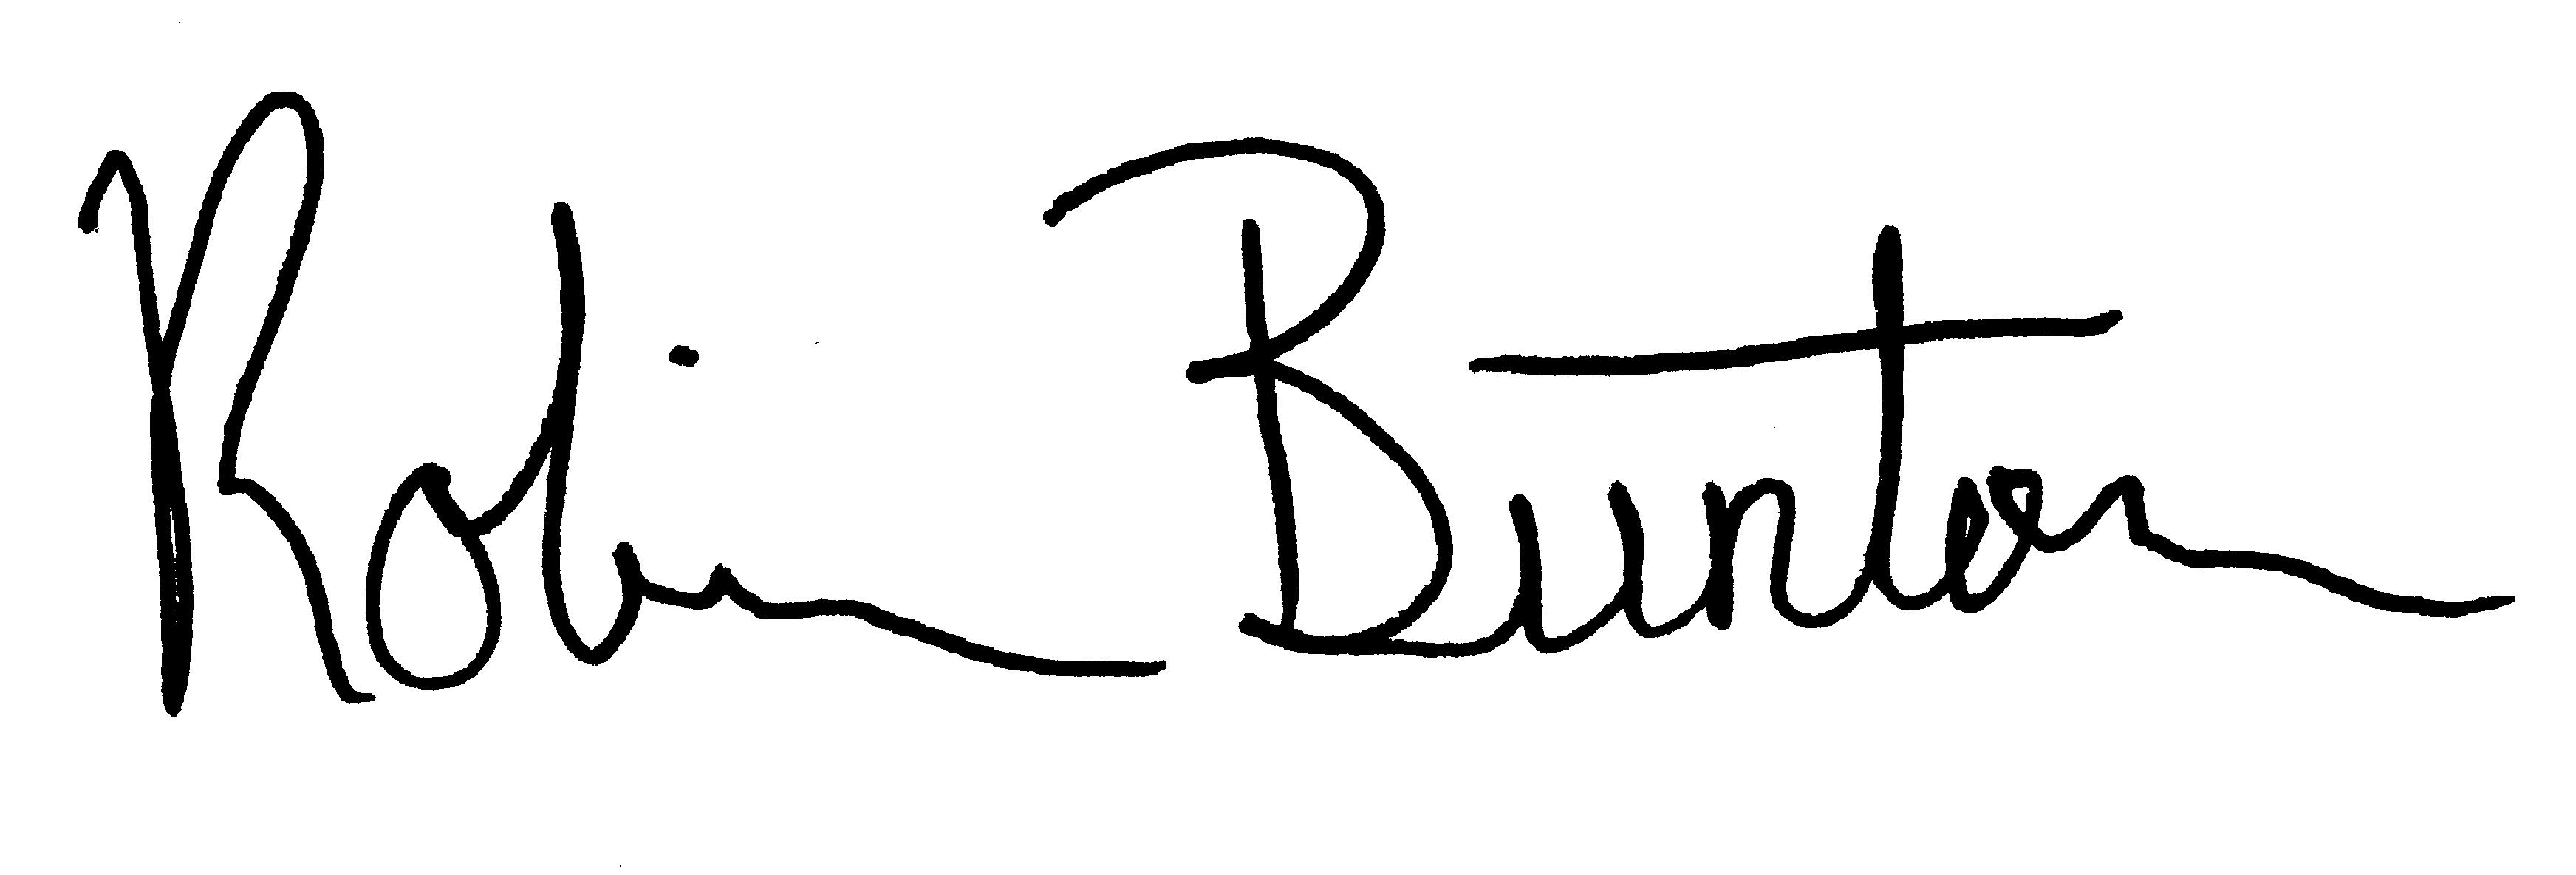 Robin Bunton's Signature